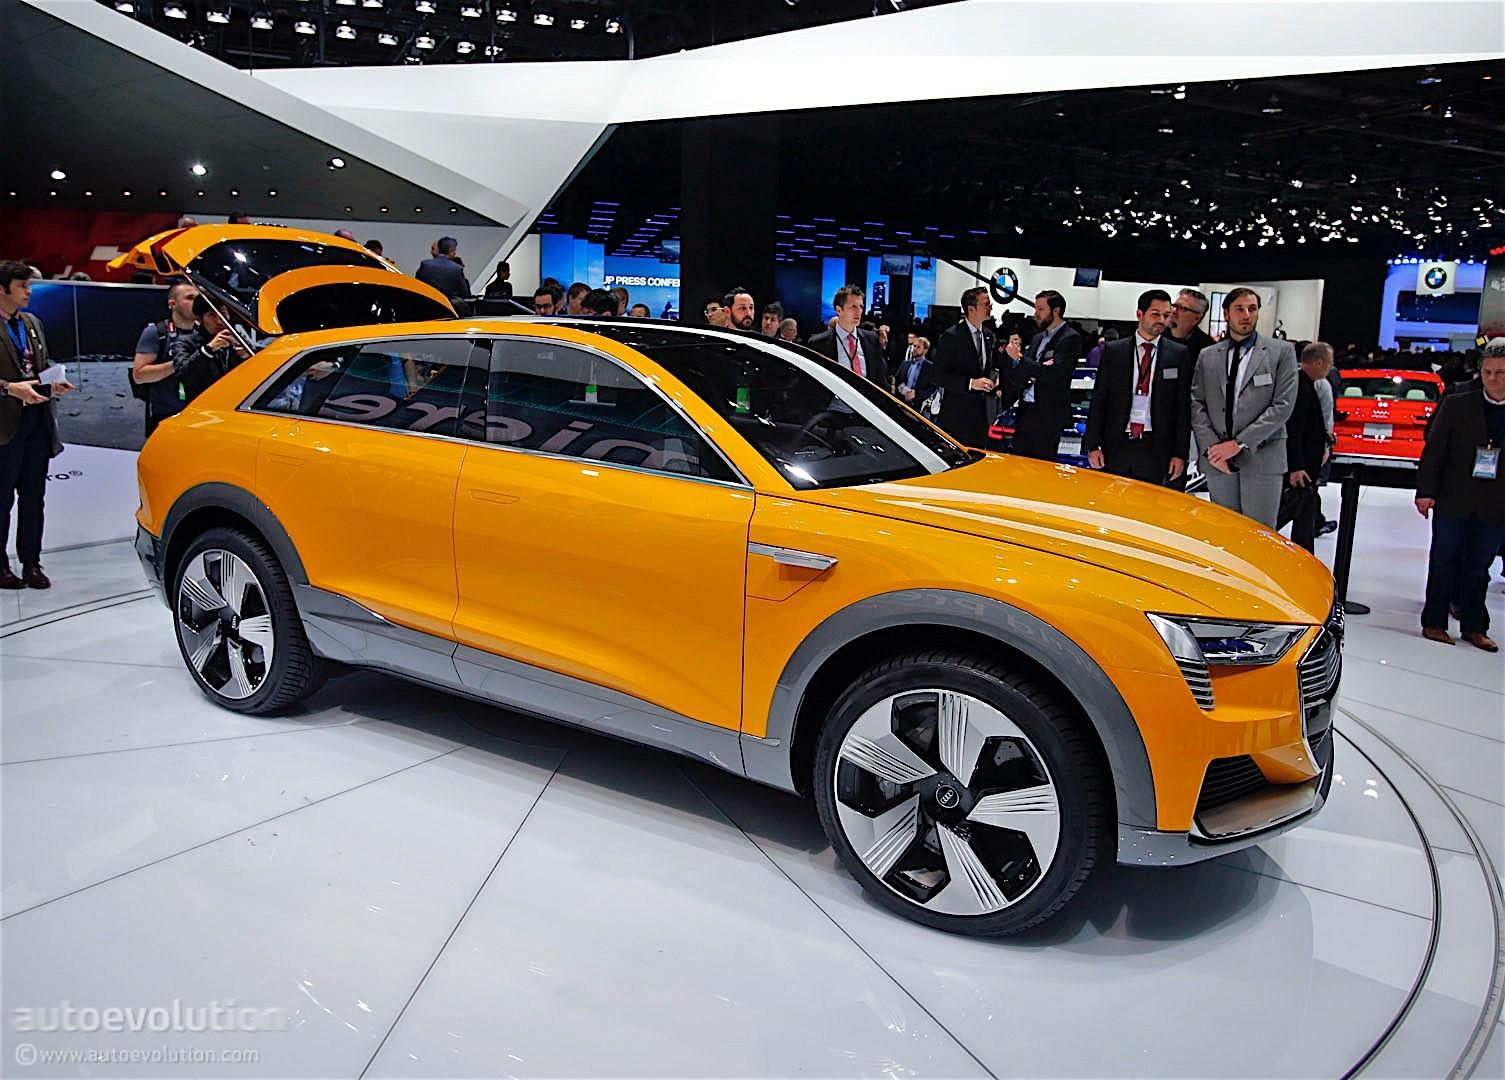 Audi H-Tron Quattro Concept Brings Yellow In Detroit